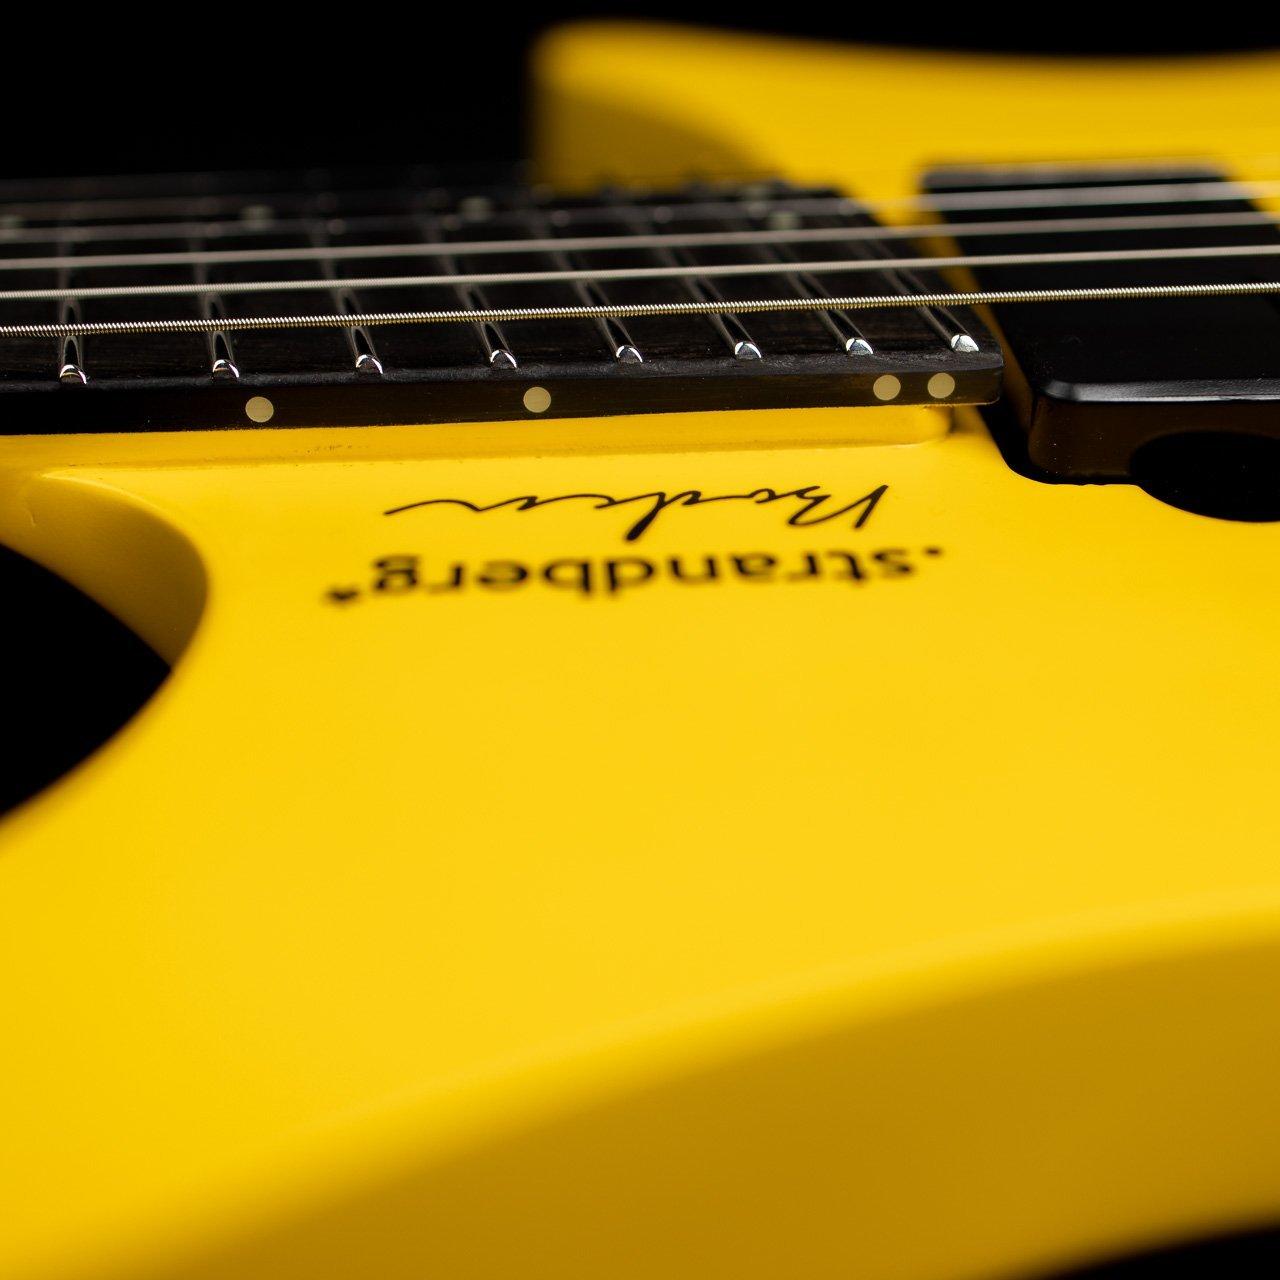 Headless Guitar Boden Metal yellow closeup